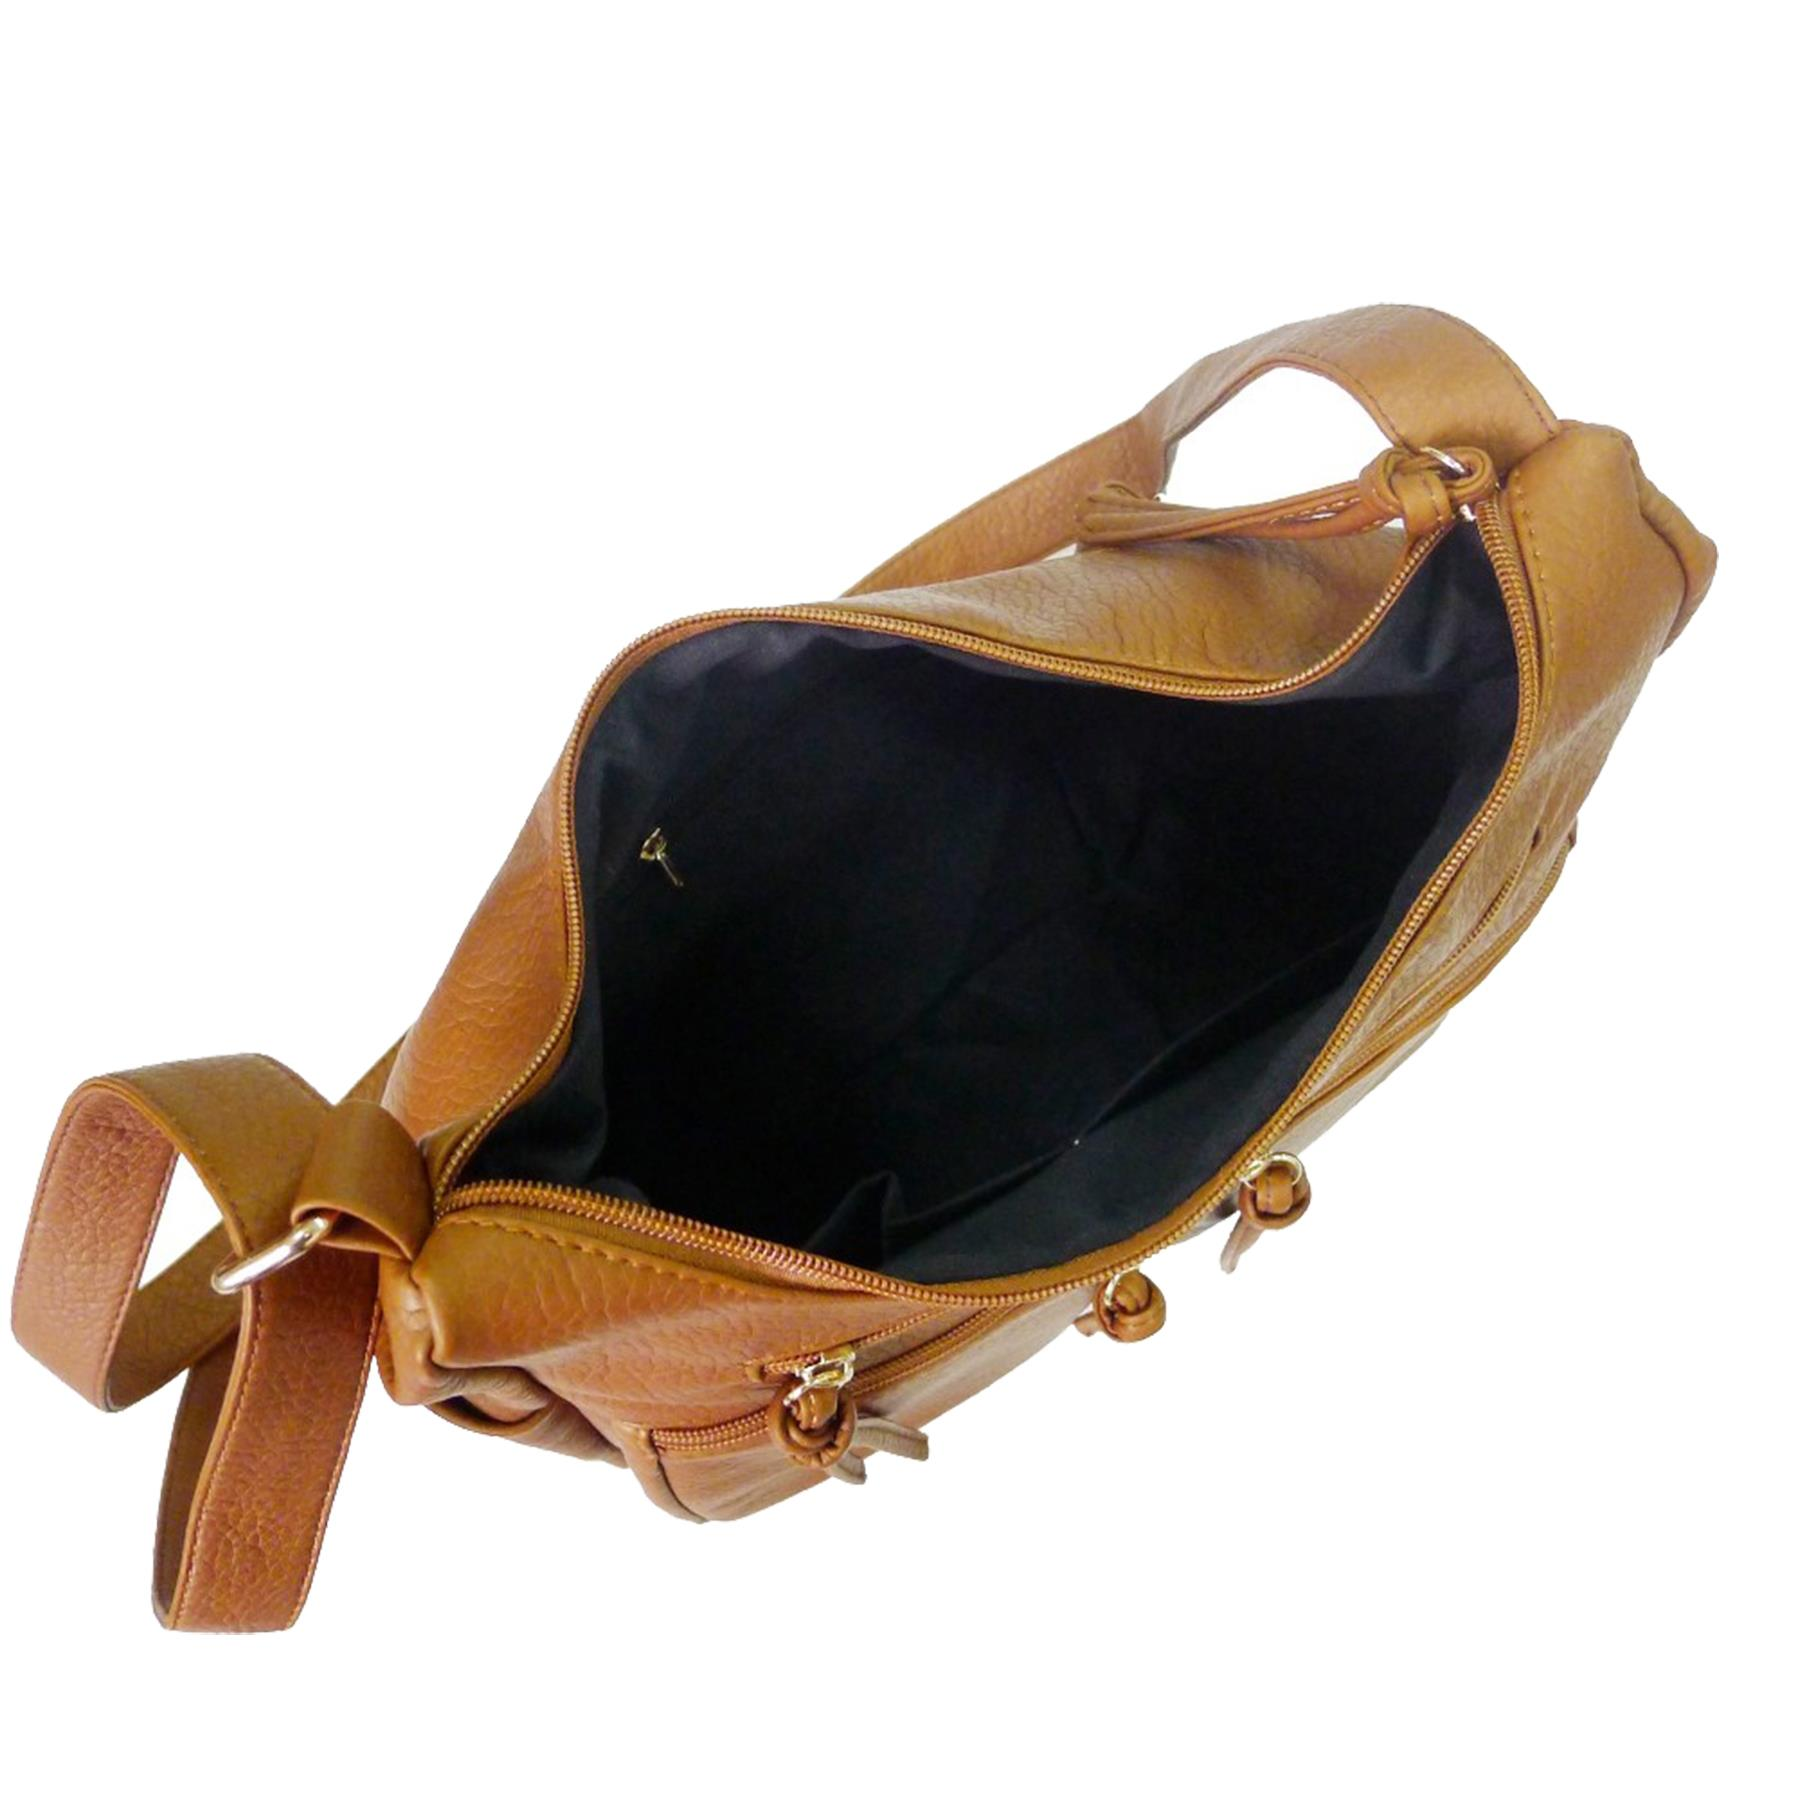 New-Unisex-Synthetic-Leather-Zip-Tassels-Multiple-Pockets-Cross-Body-Bag thumbnail 4